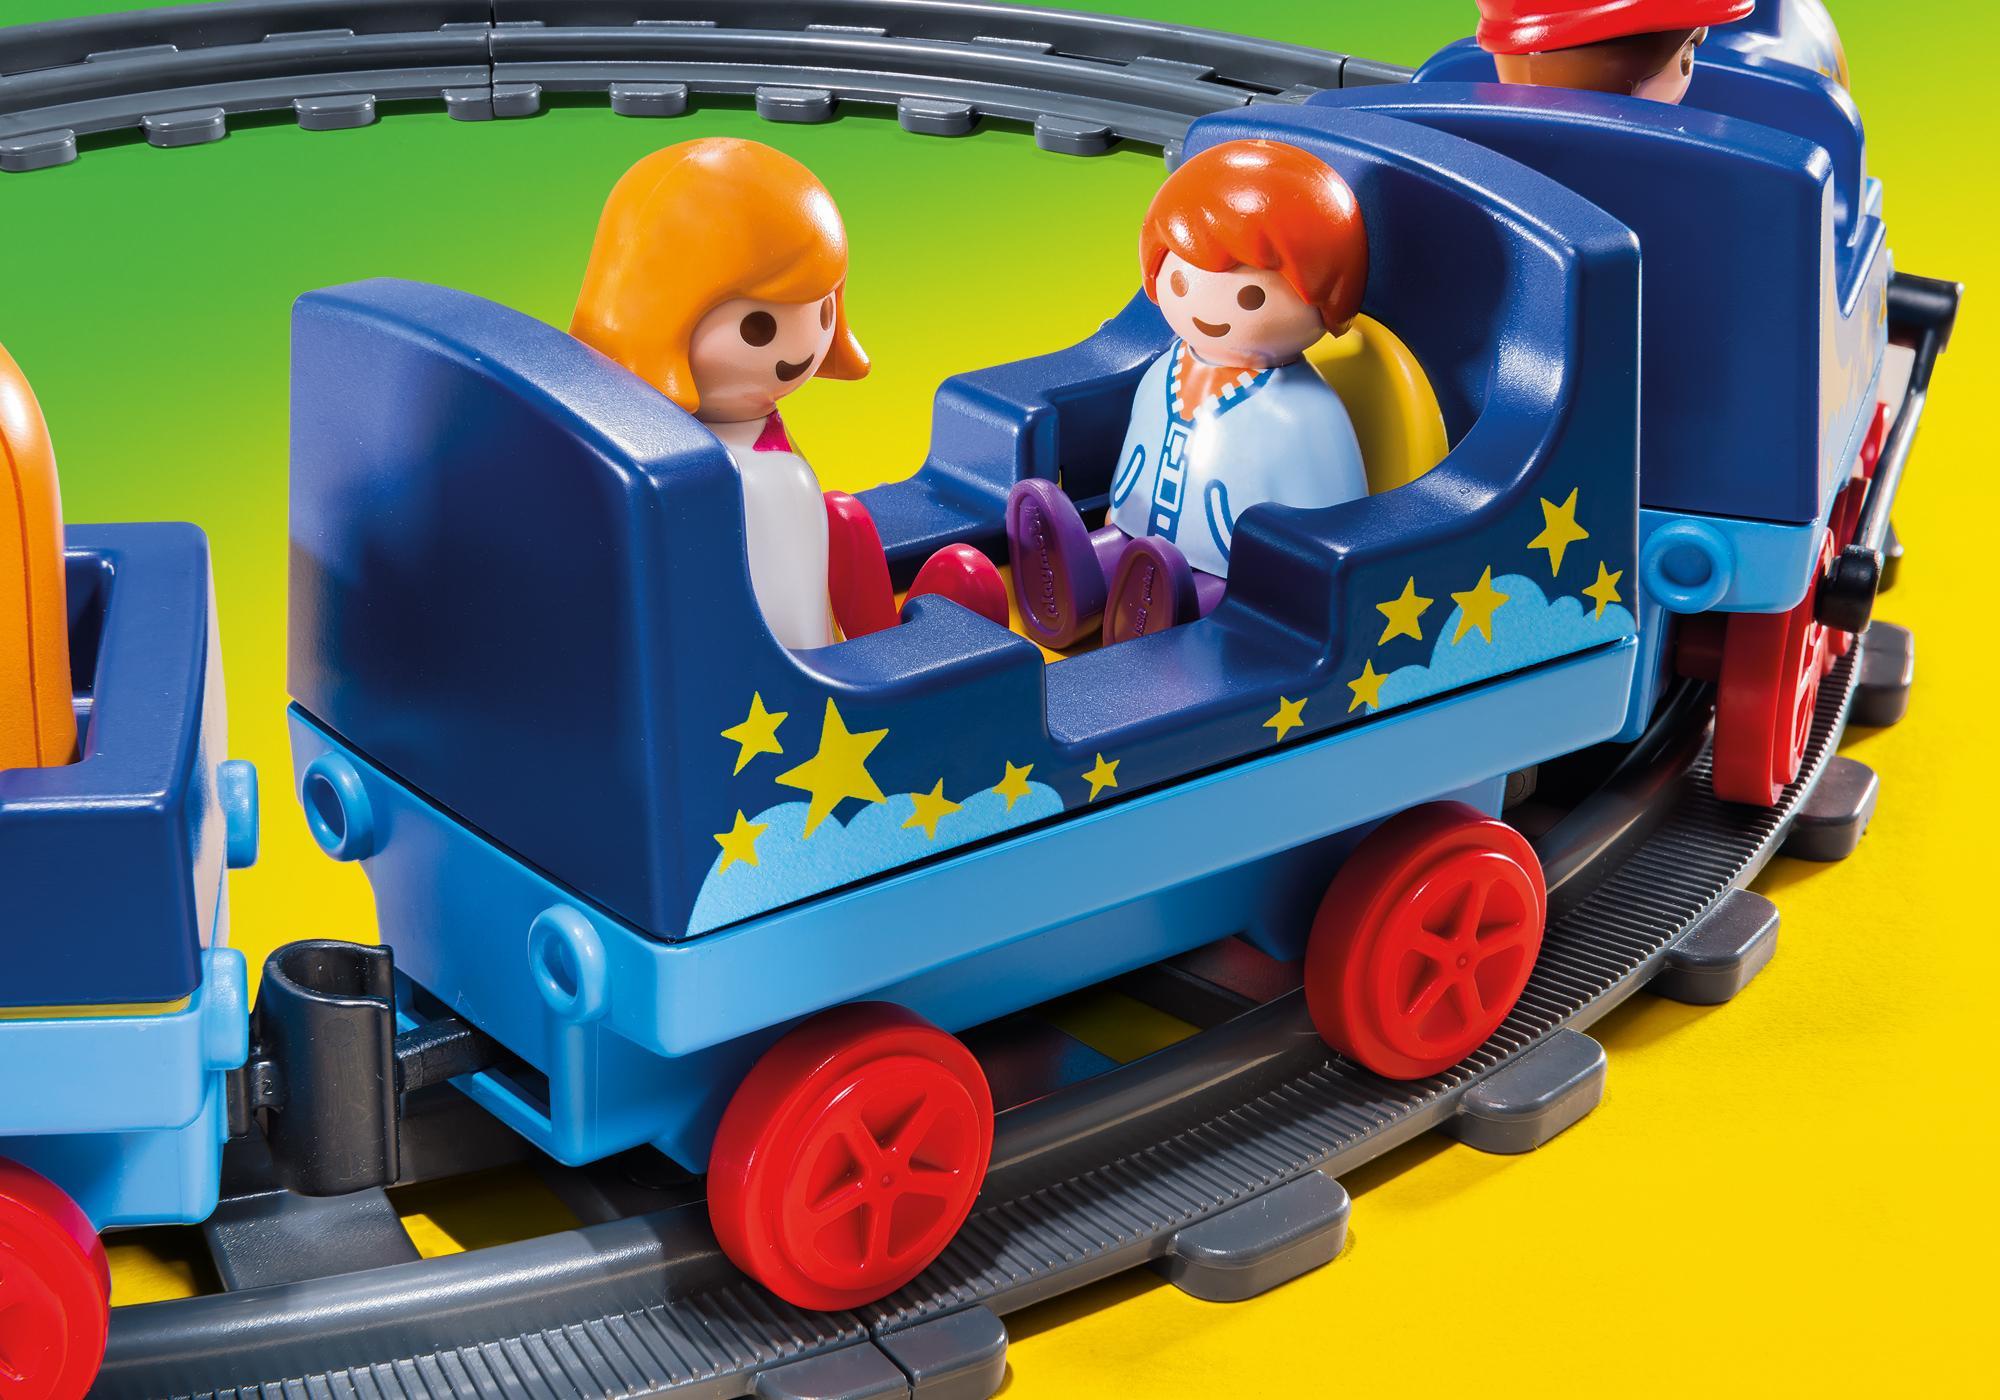 http://media.playmobil.com/i/playmobil/6880_product_extra1/Train étoilé avec passagers et rails